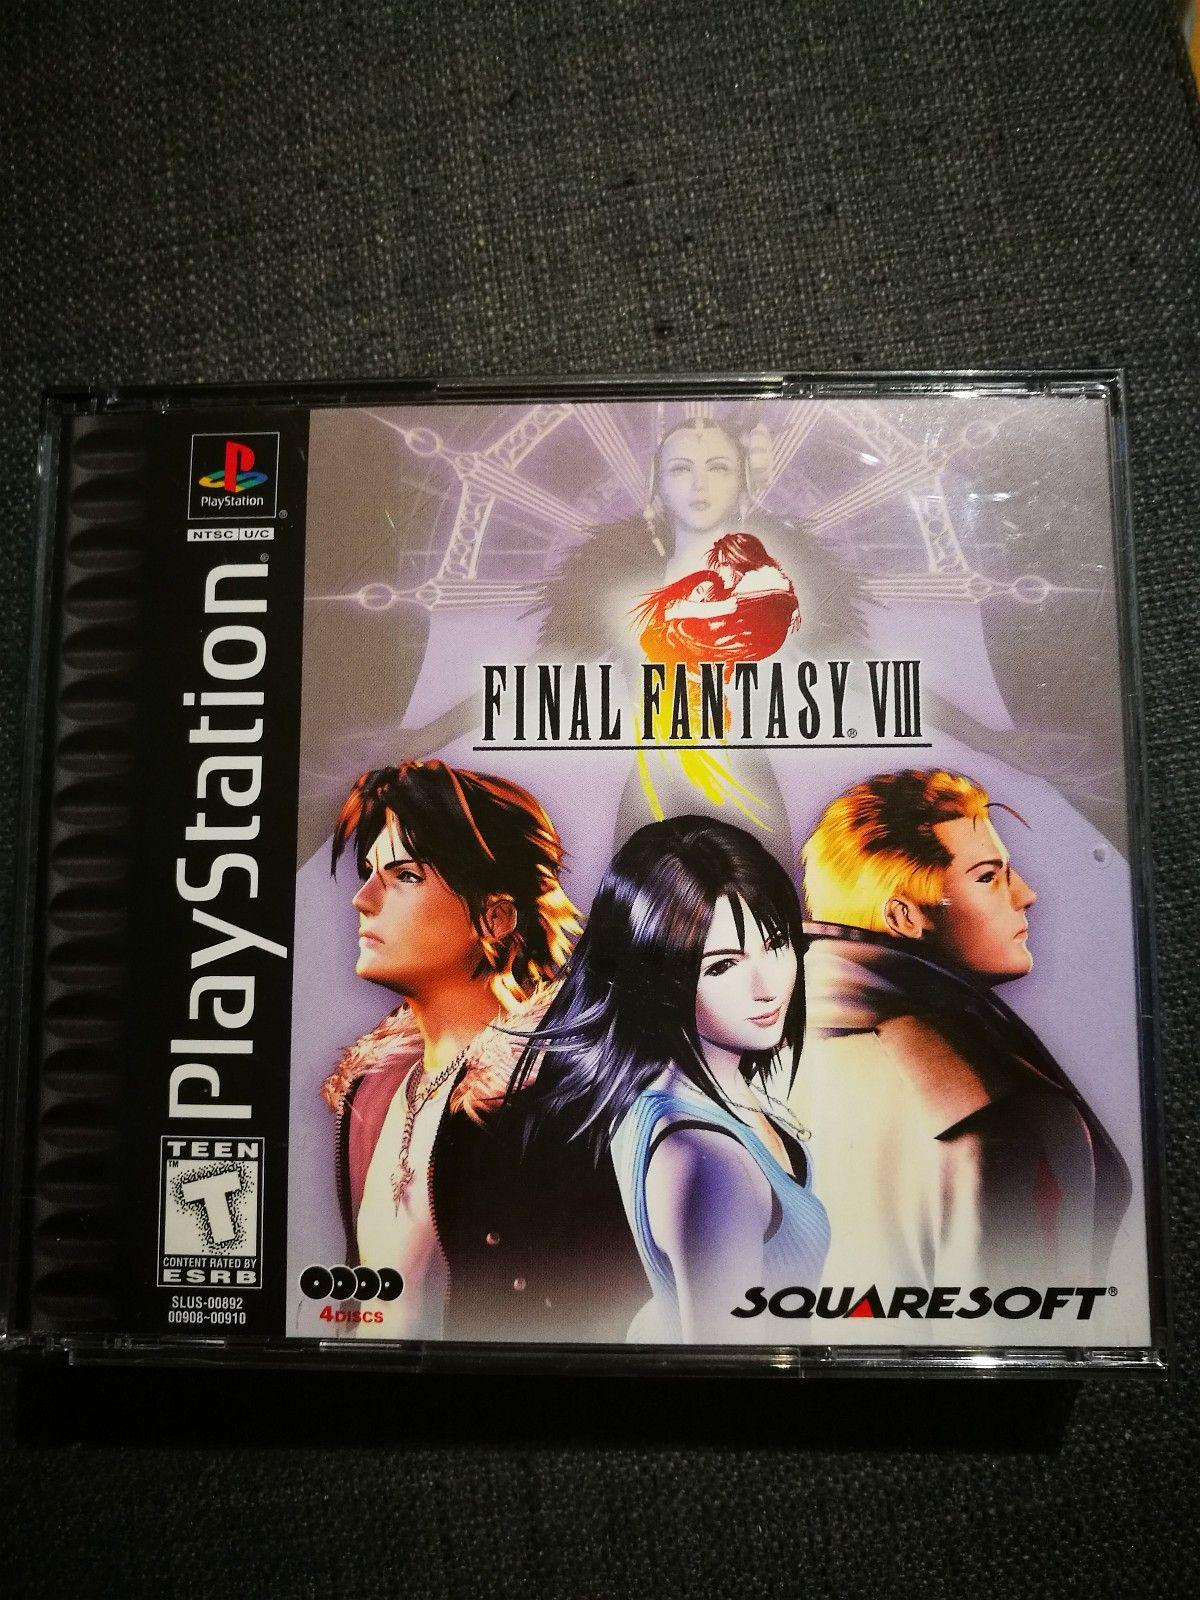 Final Fantasy VIII Ntsc Psx - Oslo  - Selger Final Fantasy VIII veldig nydelig stand. - Oslo